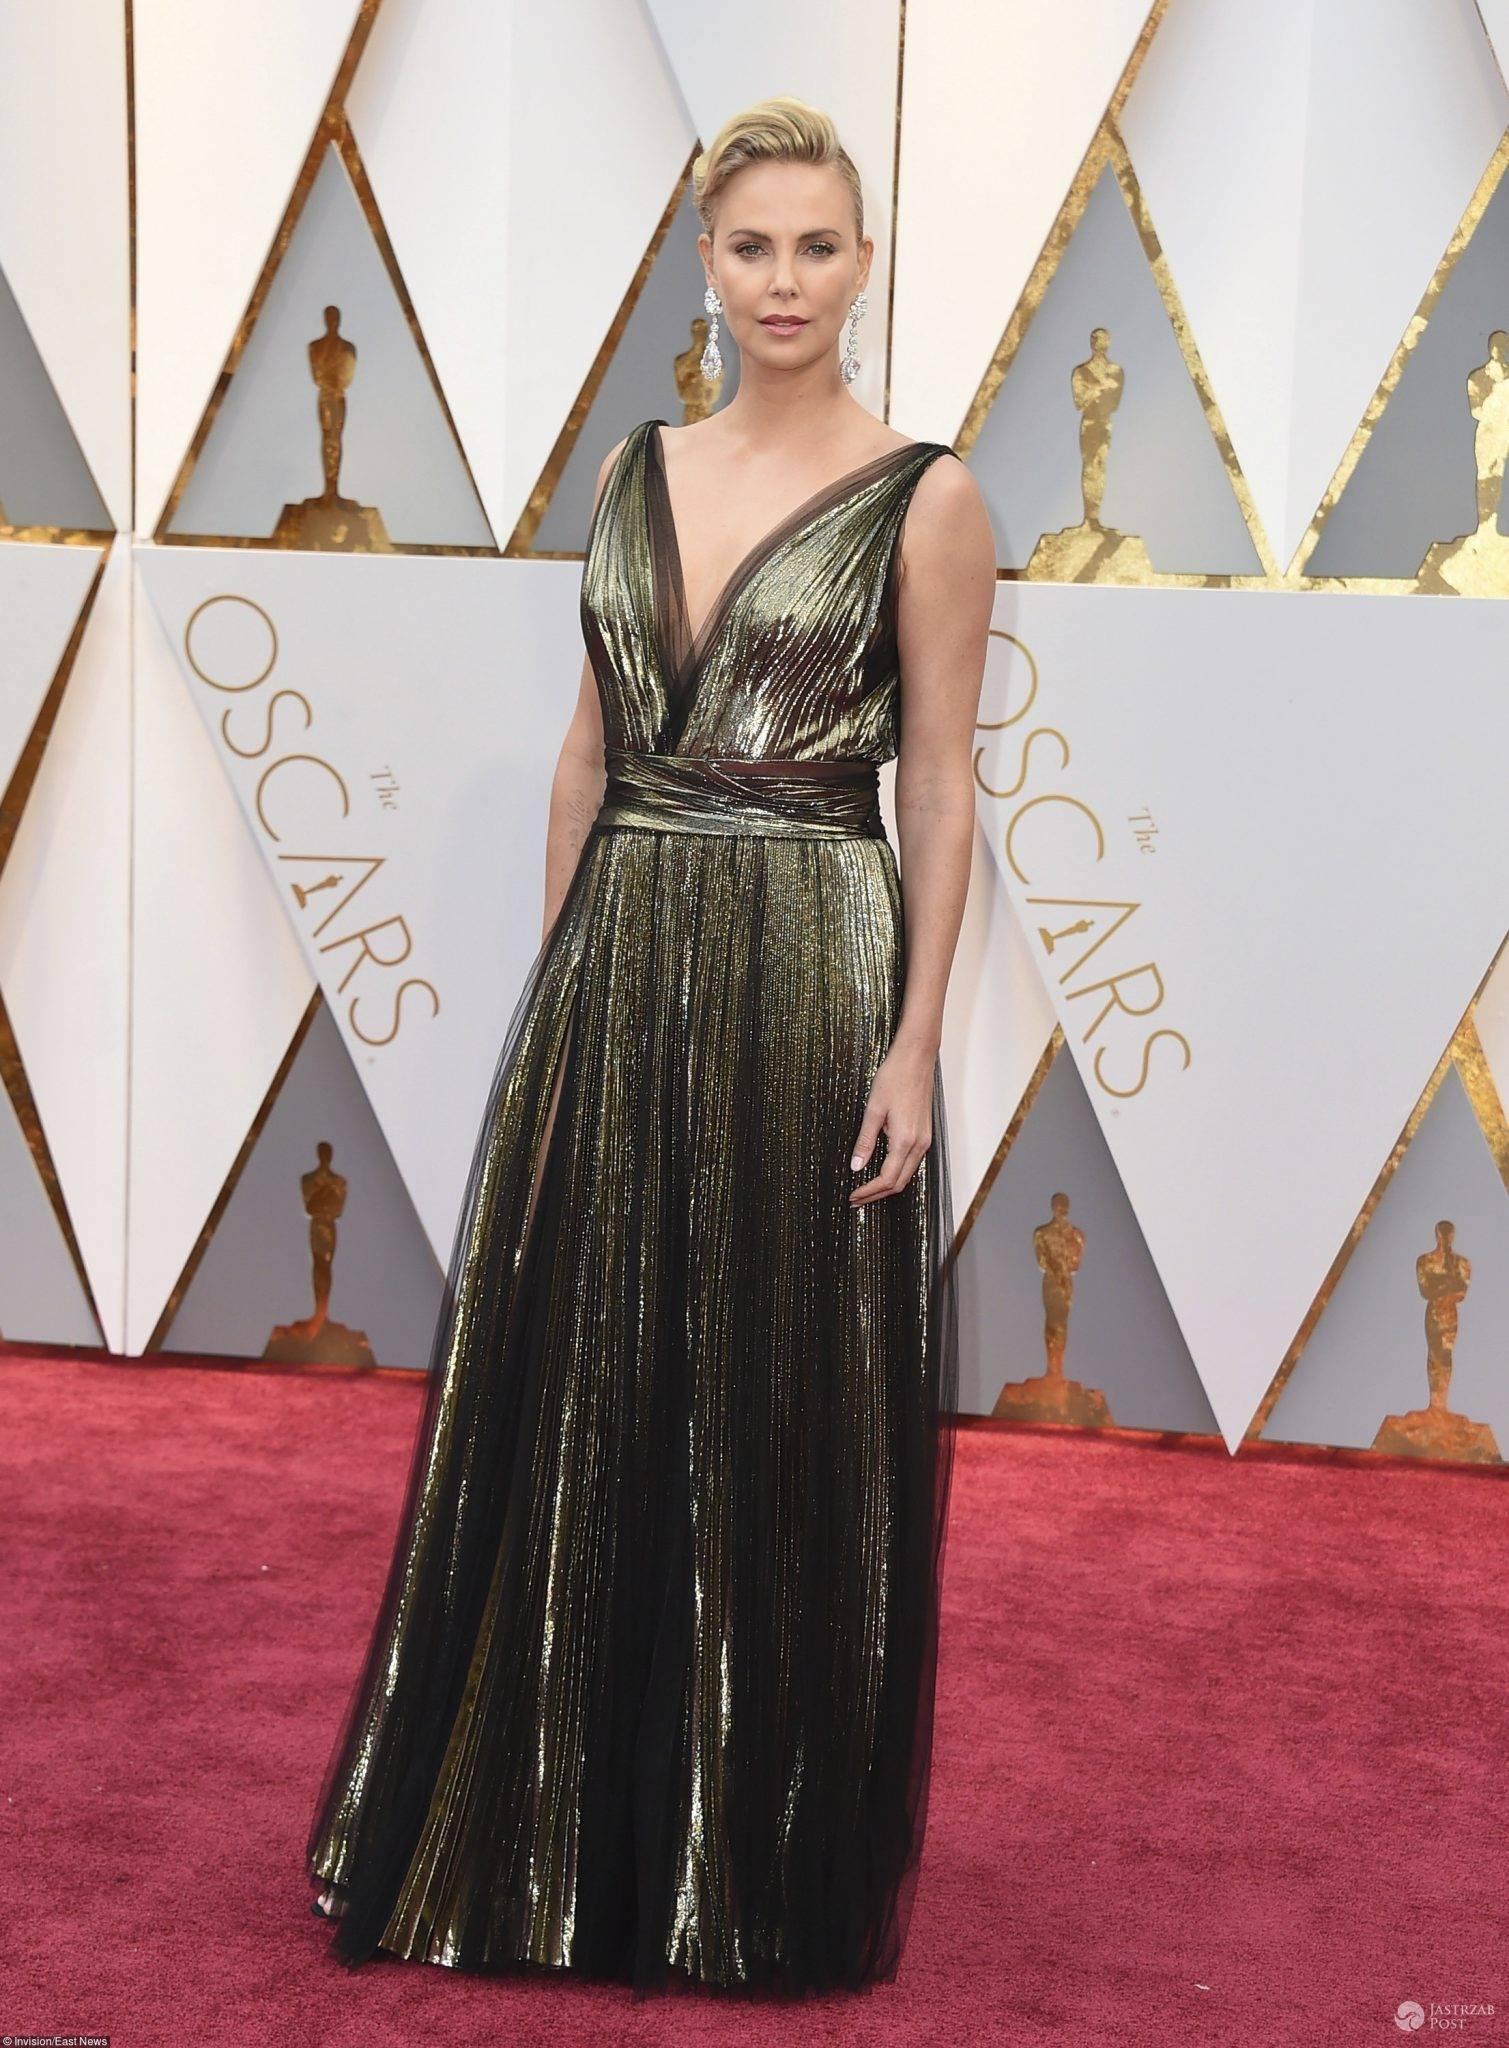 Charlize Theron - Oscary 2017 (kreacja: Dior)